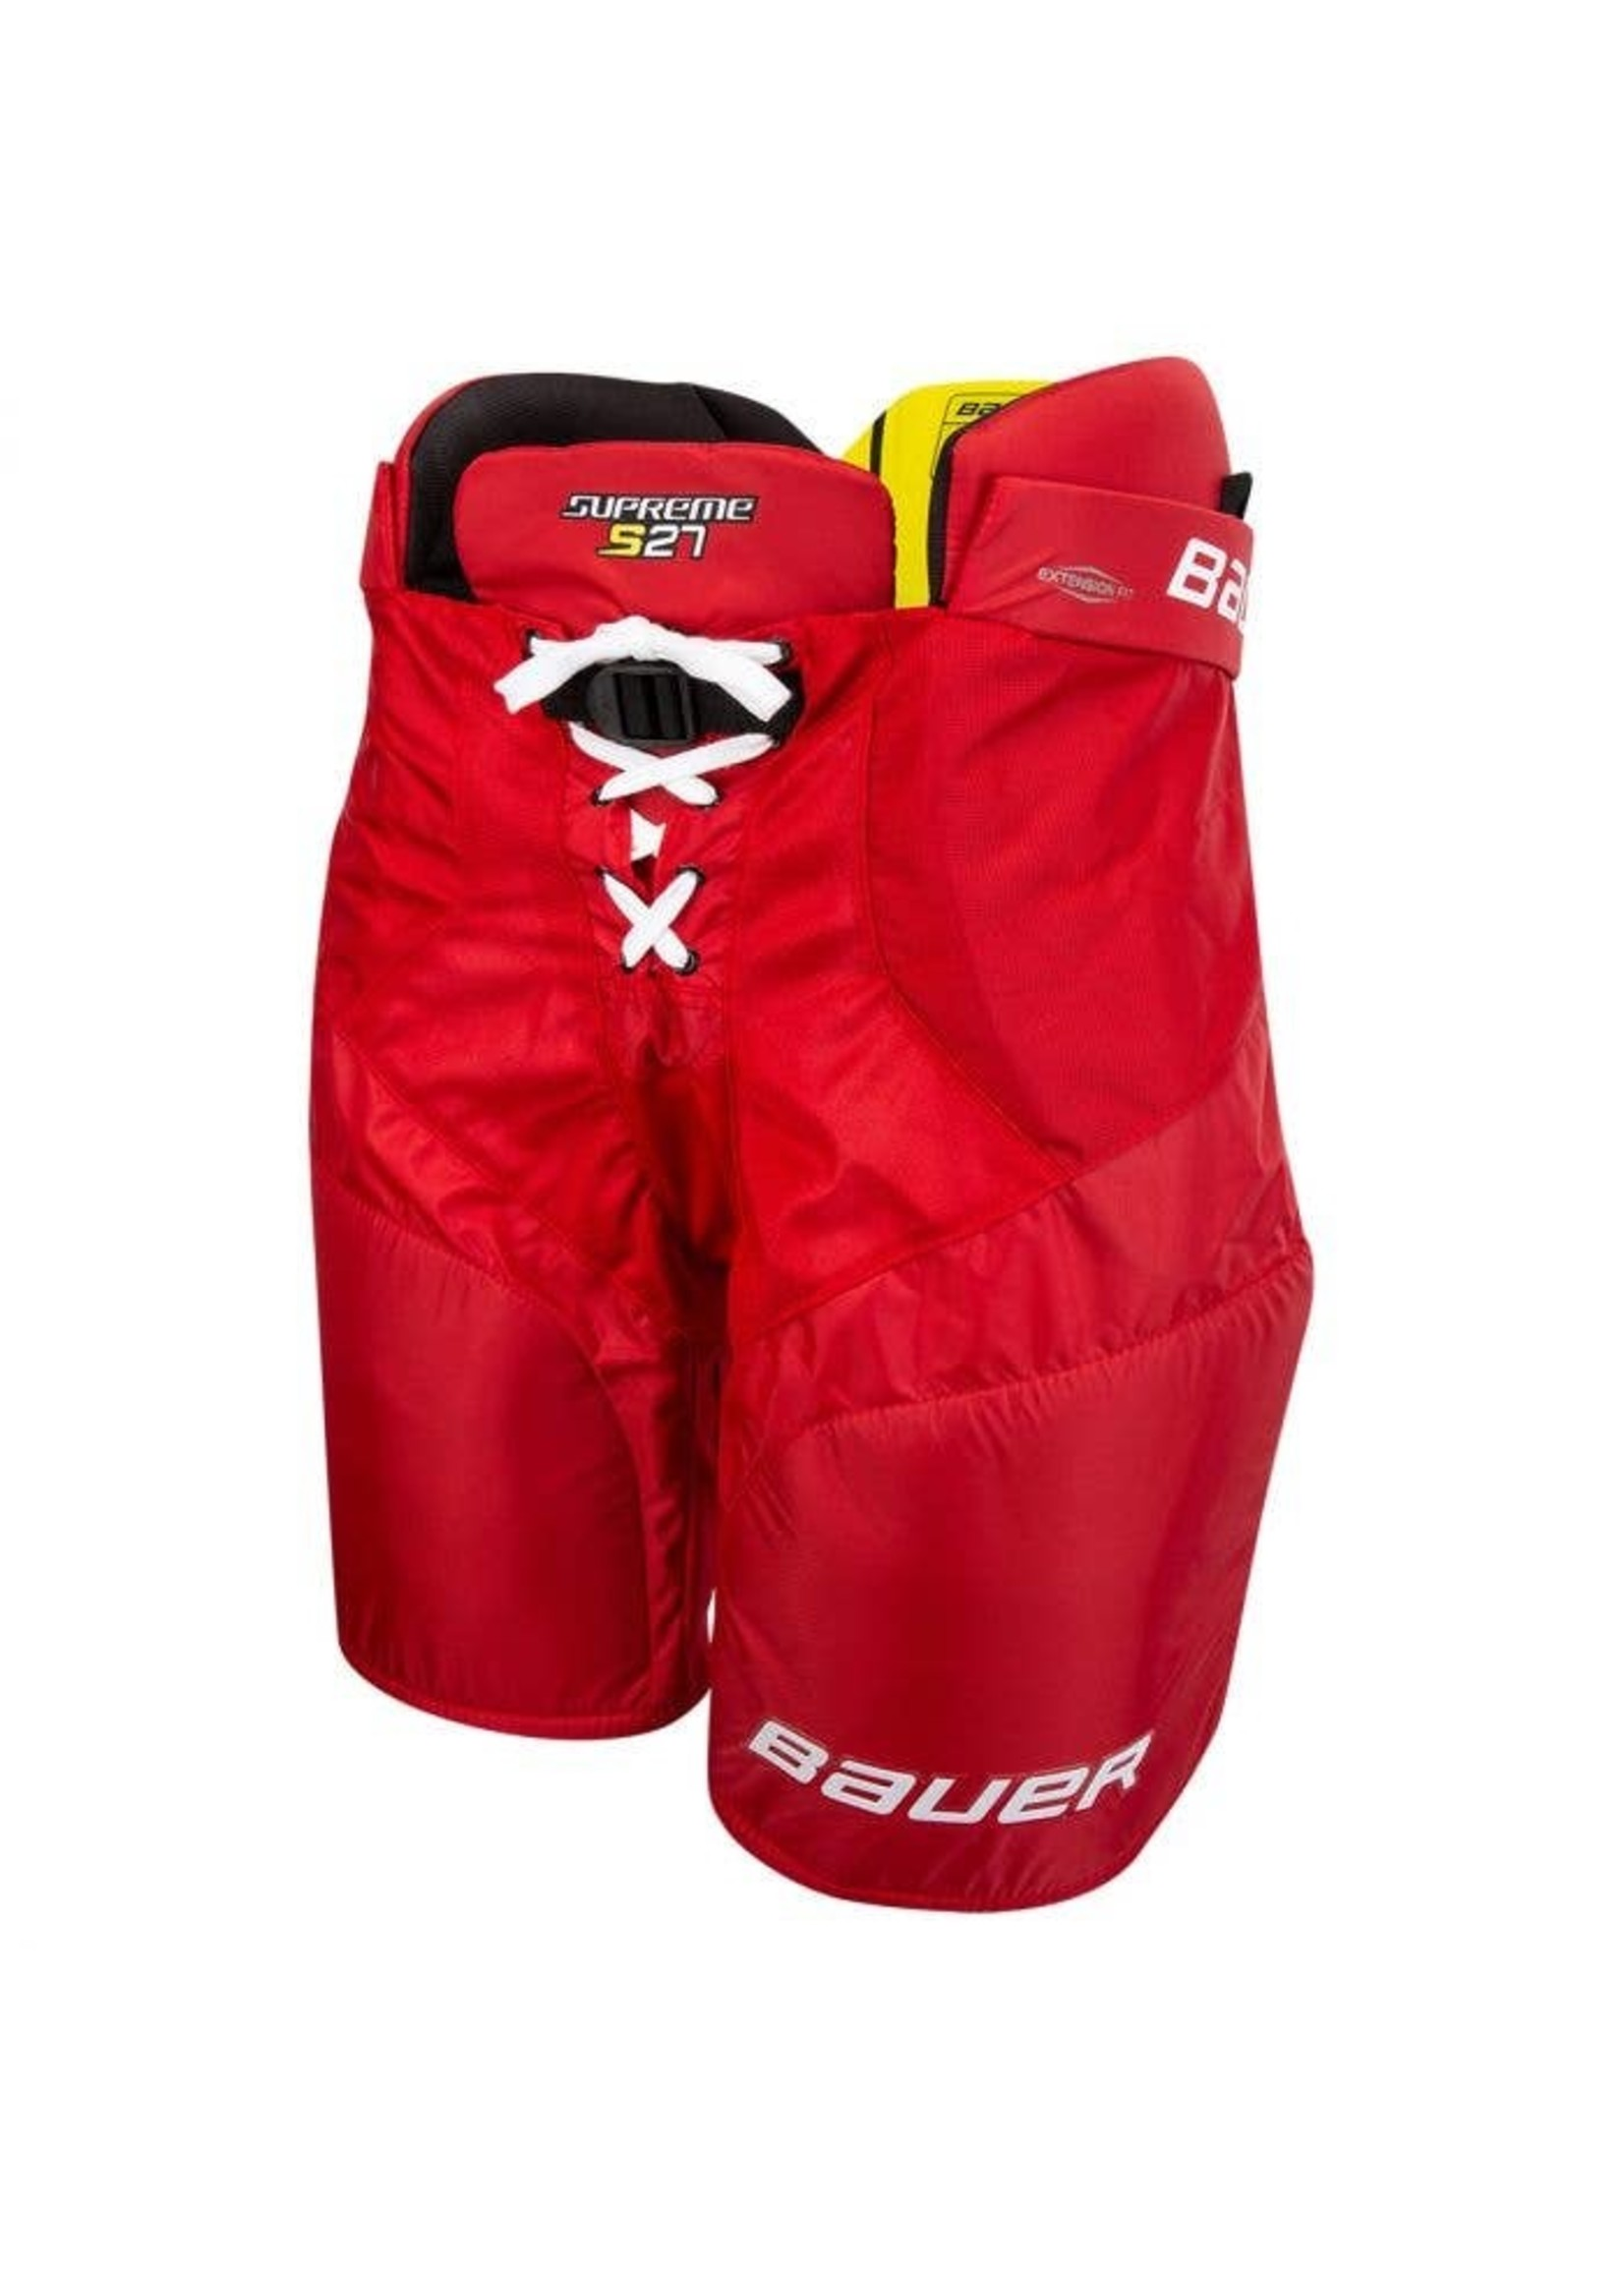 Bauer Hockey BAUER S19 SUPREME S27 SR PANTS